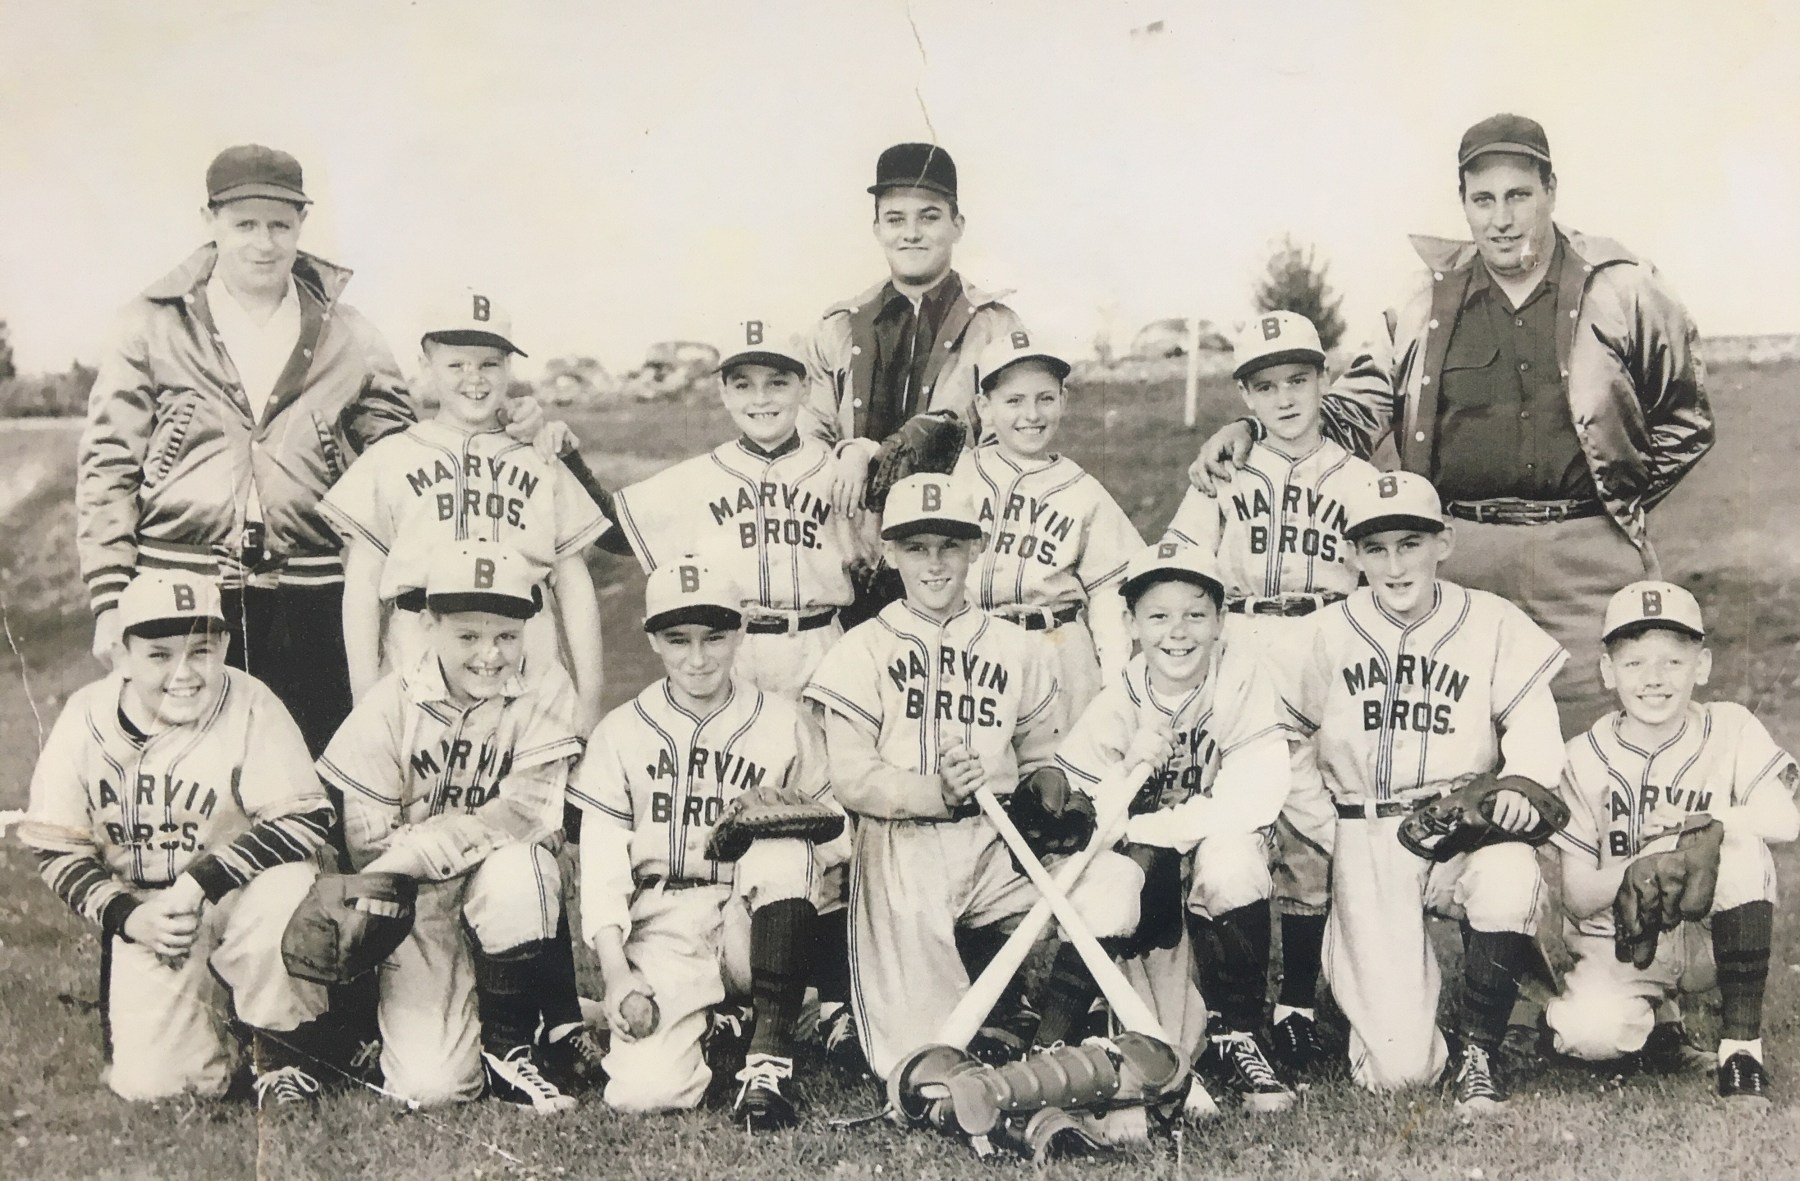 Marvin Bros. little league team, Burlington MA. Photo credit: Richard Sheppard (front row, center position).